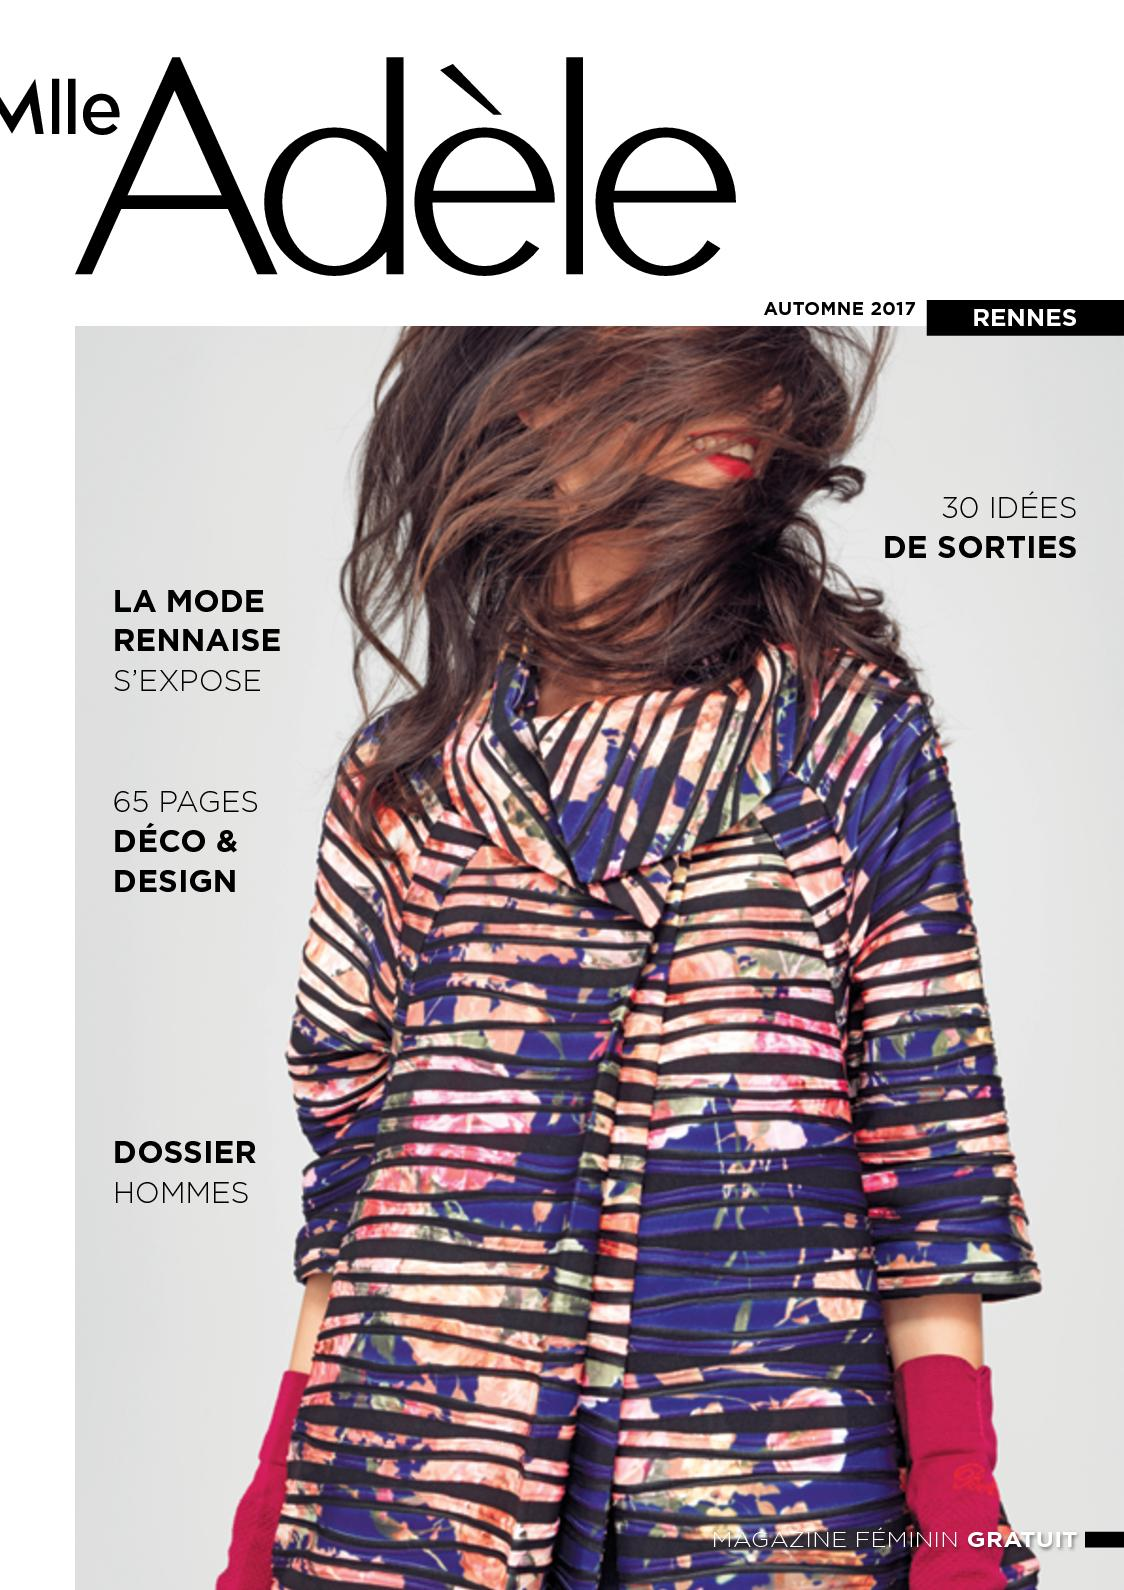 Calaméo - Magazine Mlle Adèle Rennes N°16 1aad5af32a3